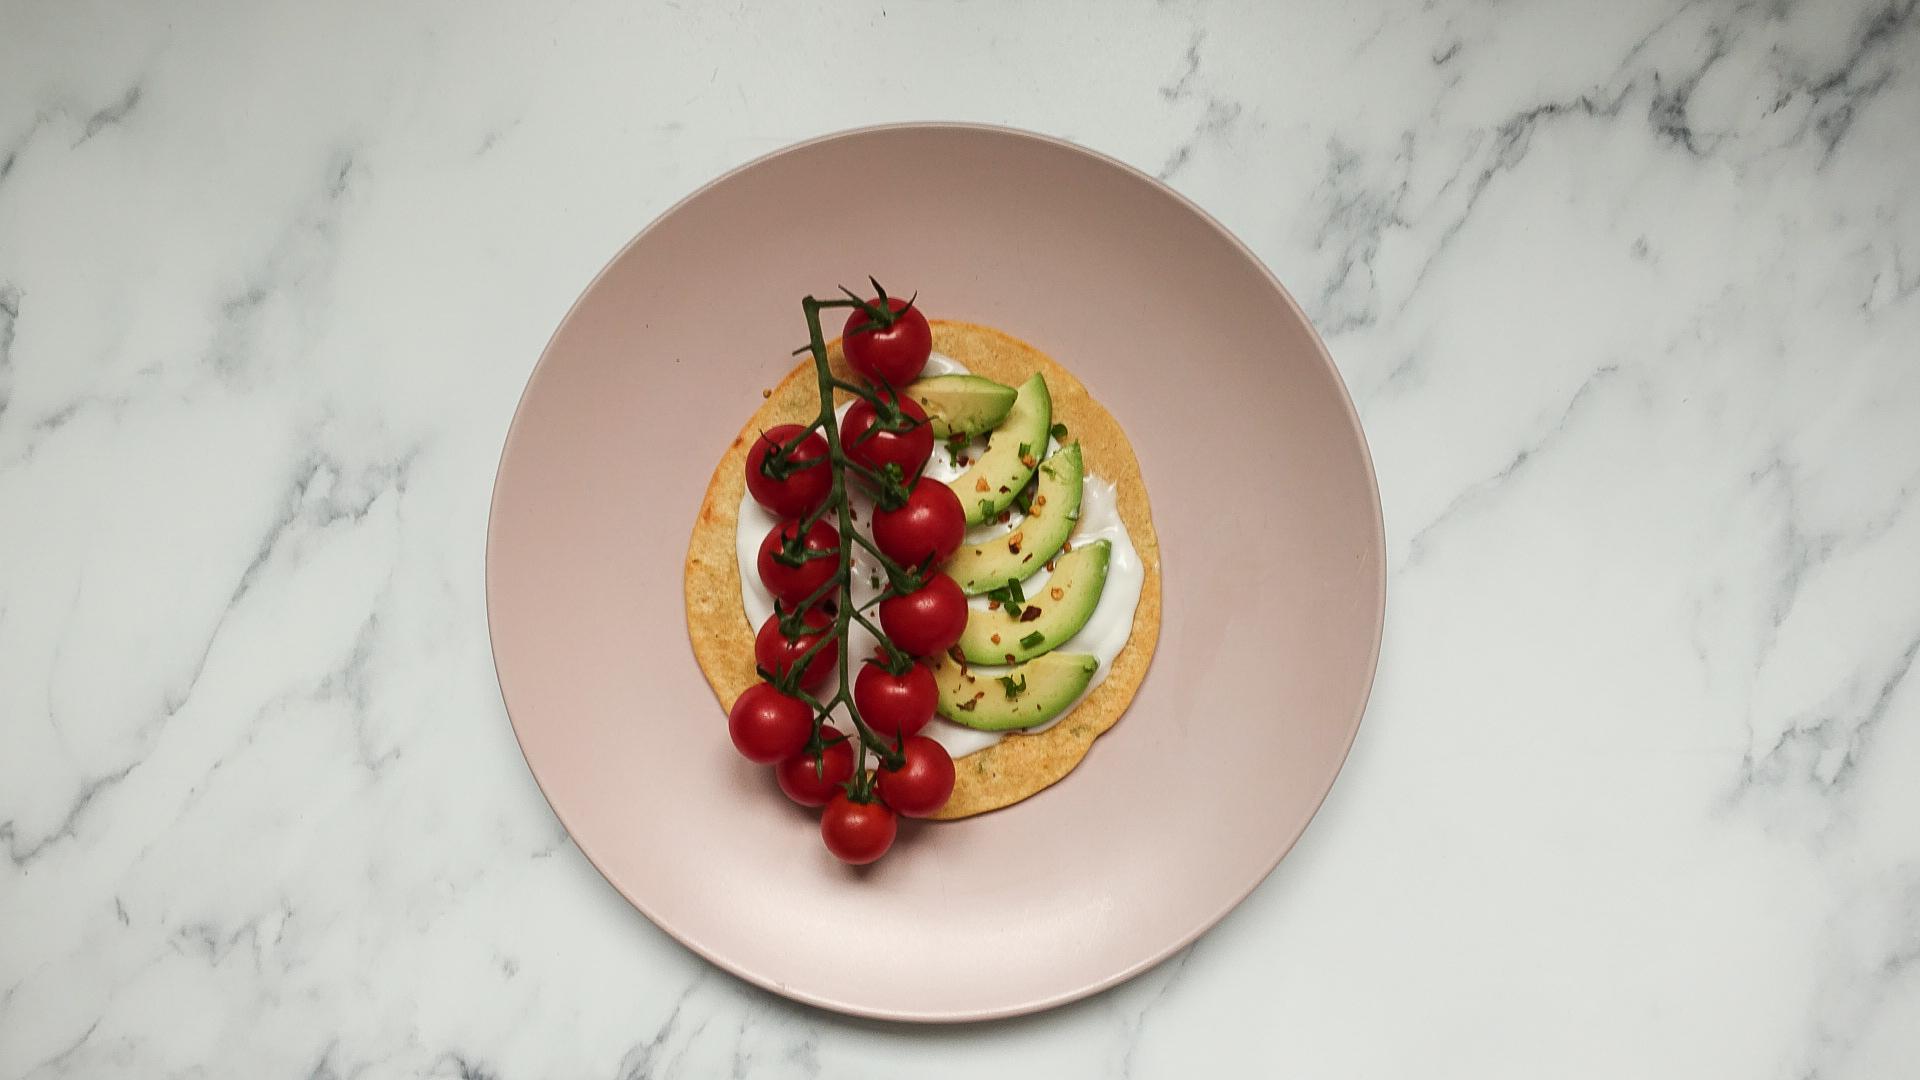 Food Jil Carrara Jil Carrara Sustainable Fashion And